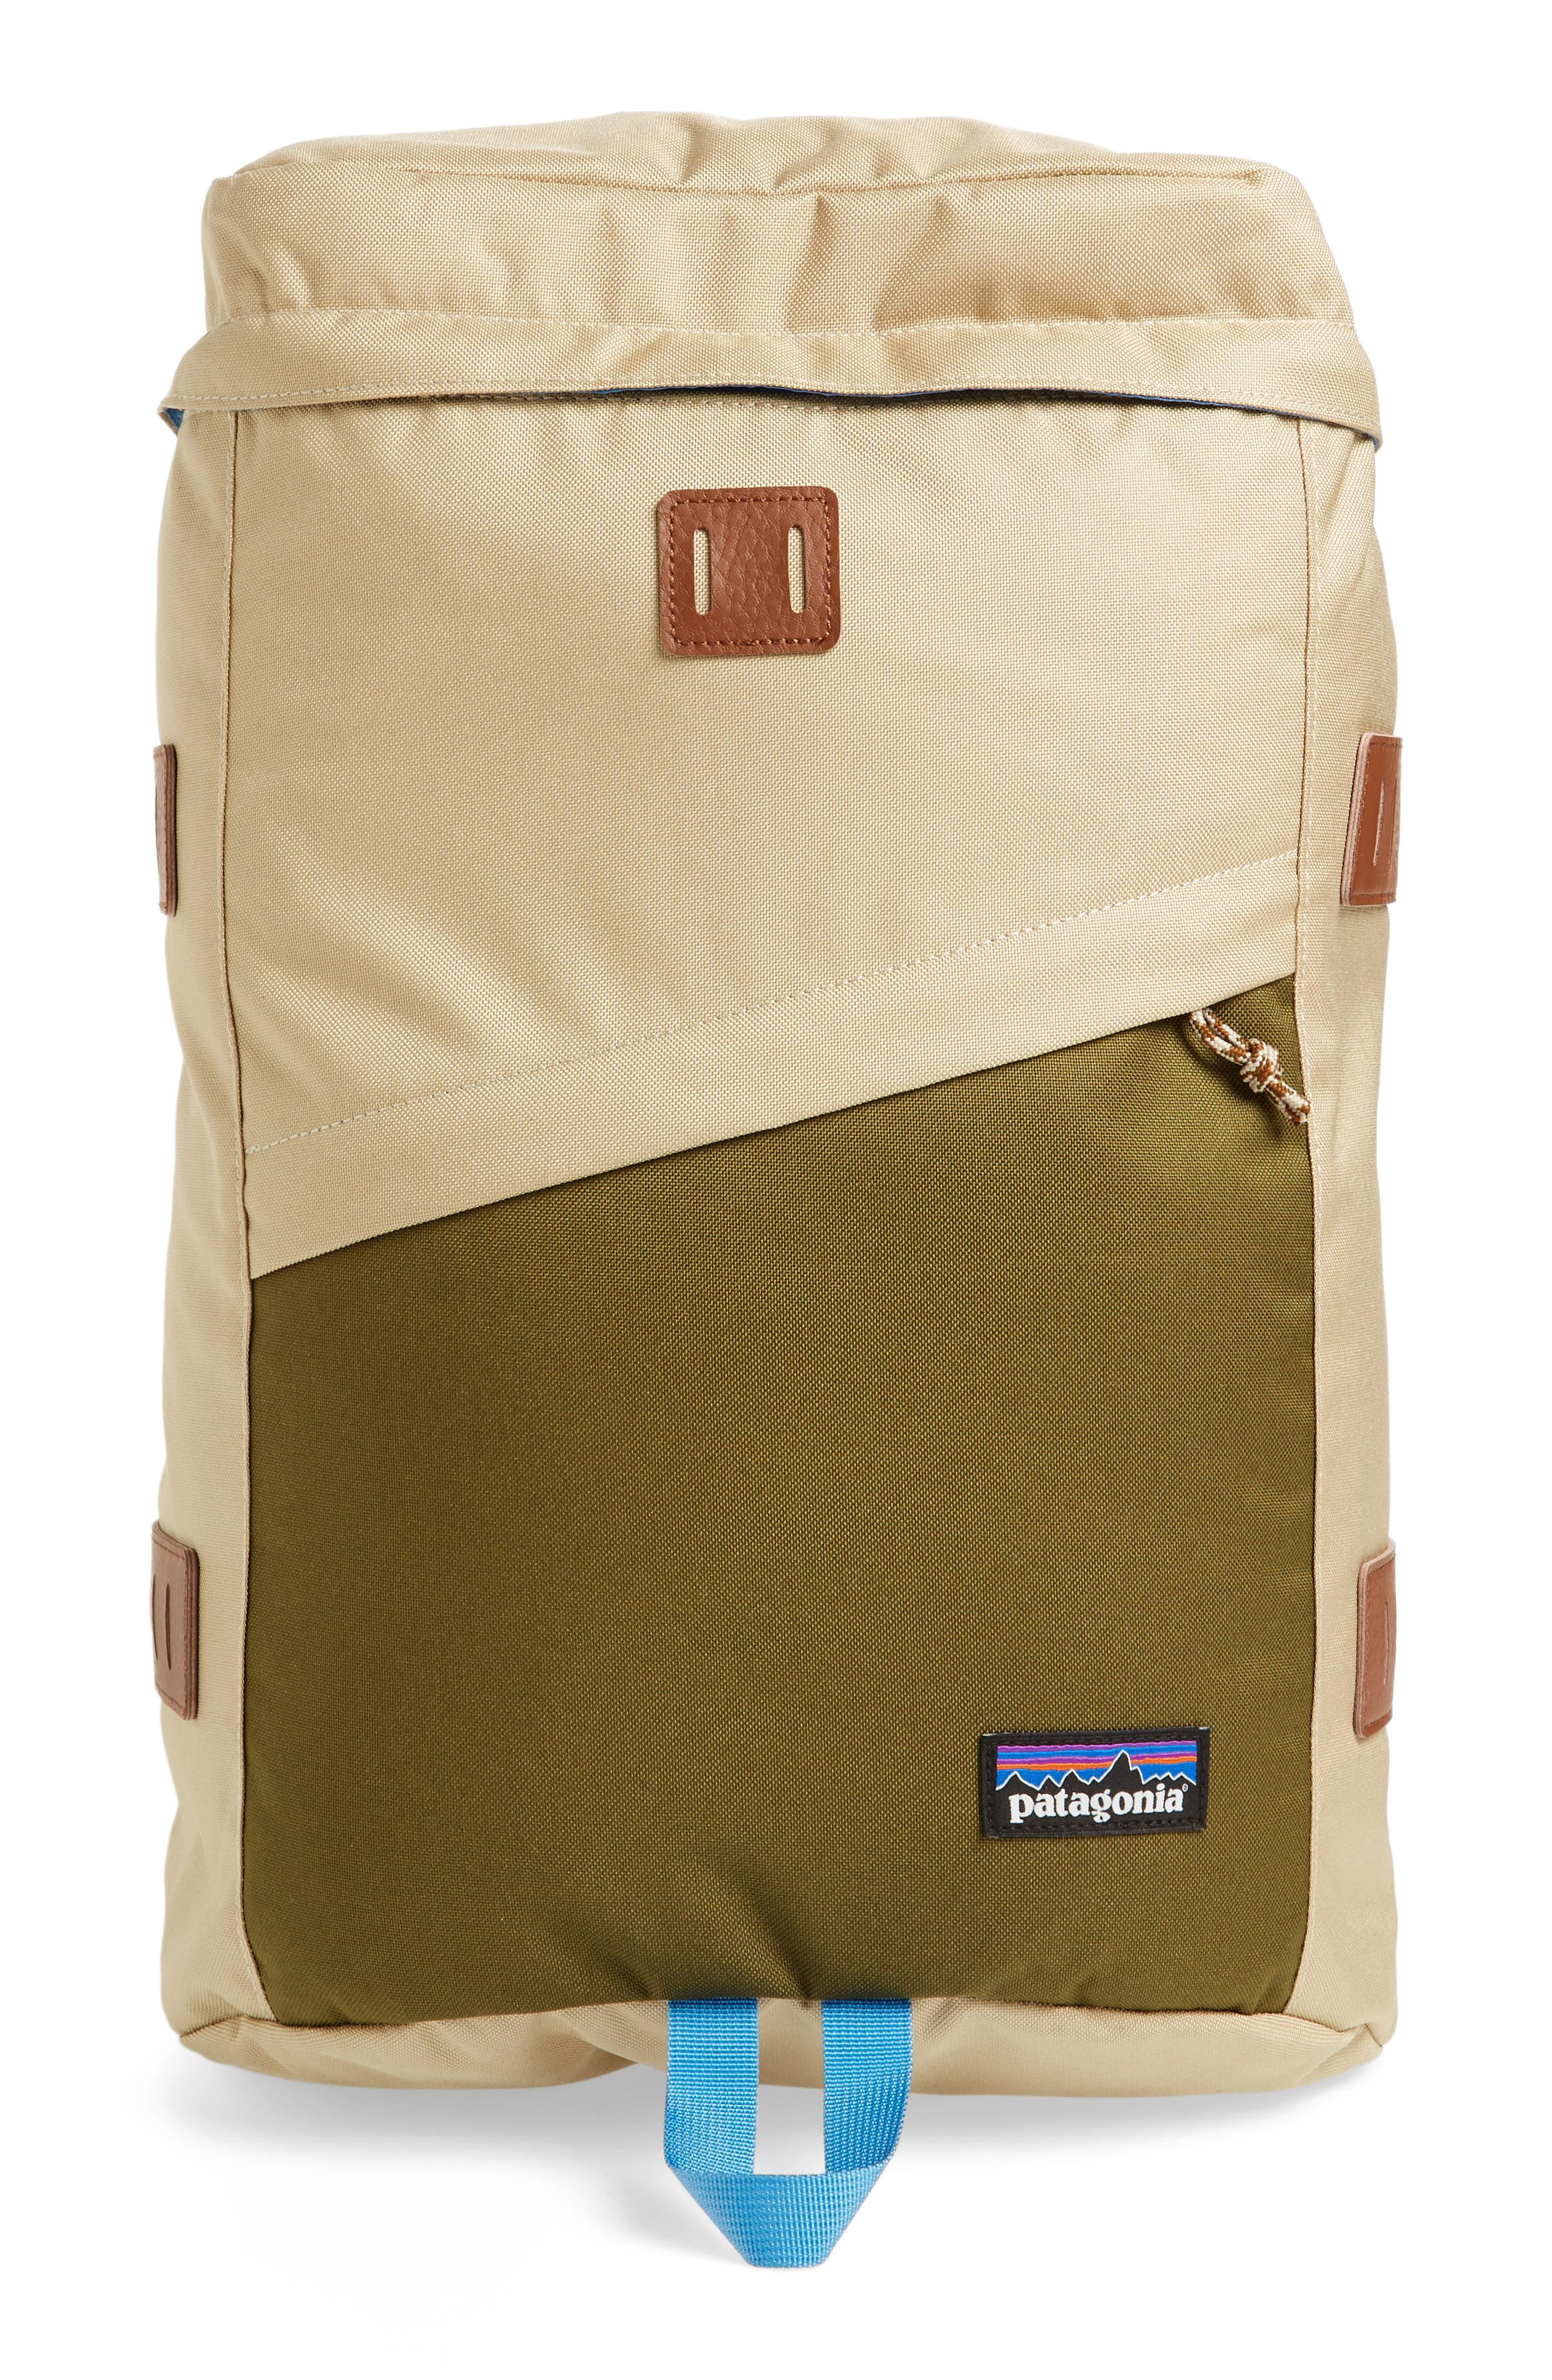 Alternate Image 1 Selected - Patagonia 'Toromiro' Backpack (22 Liter)